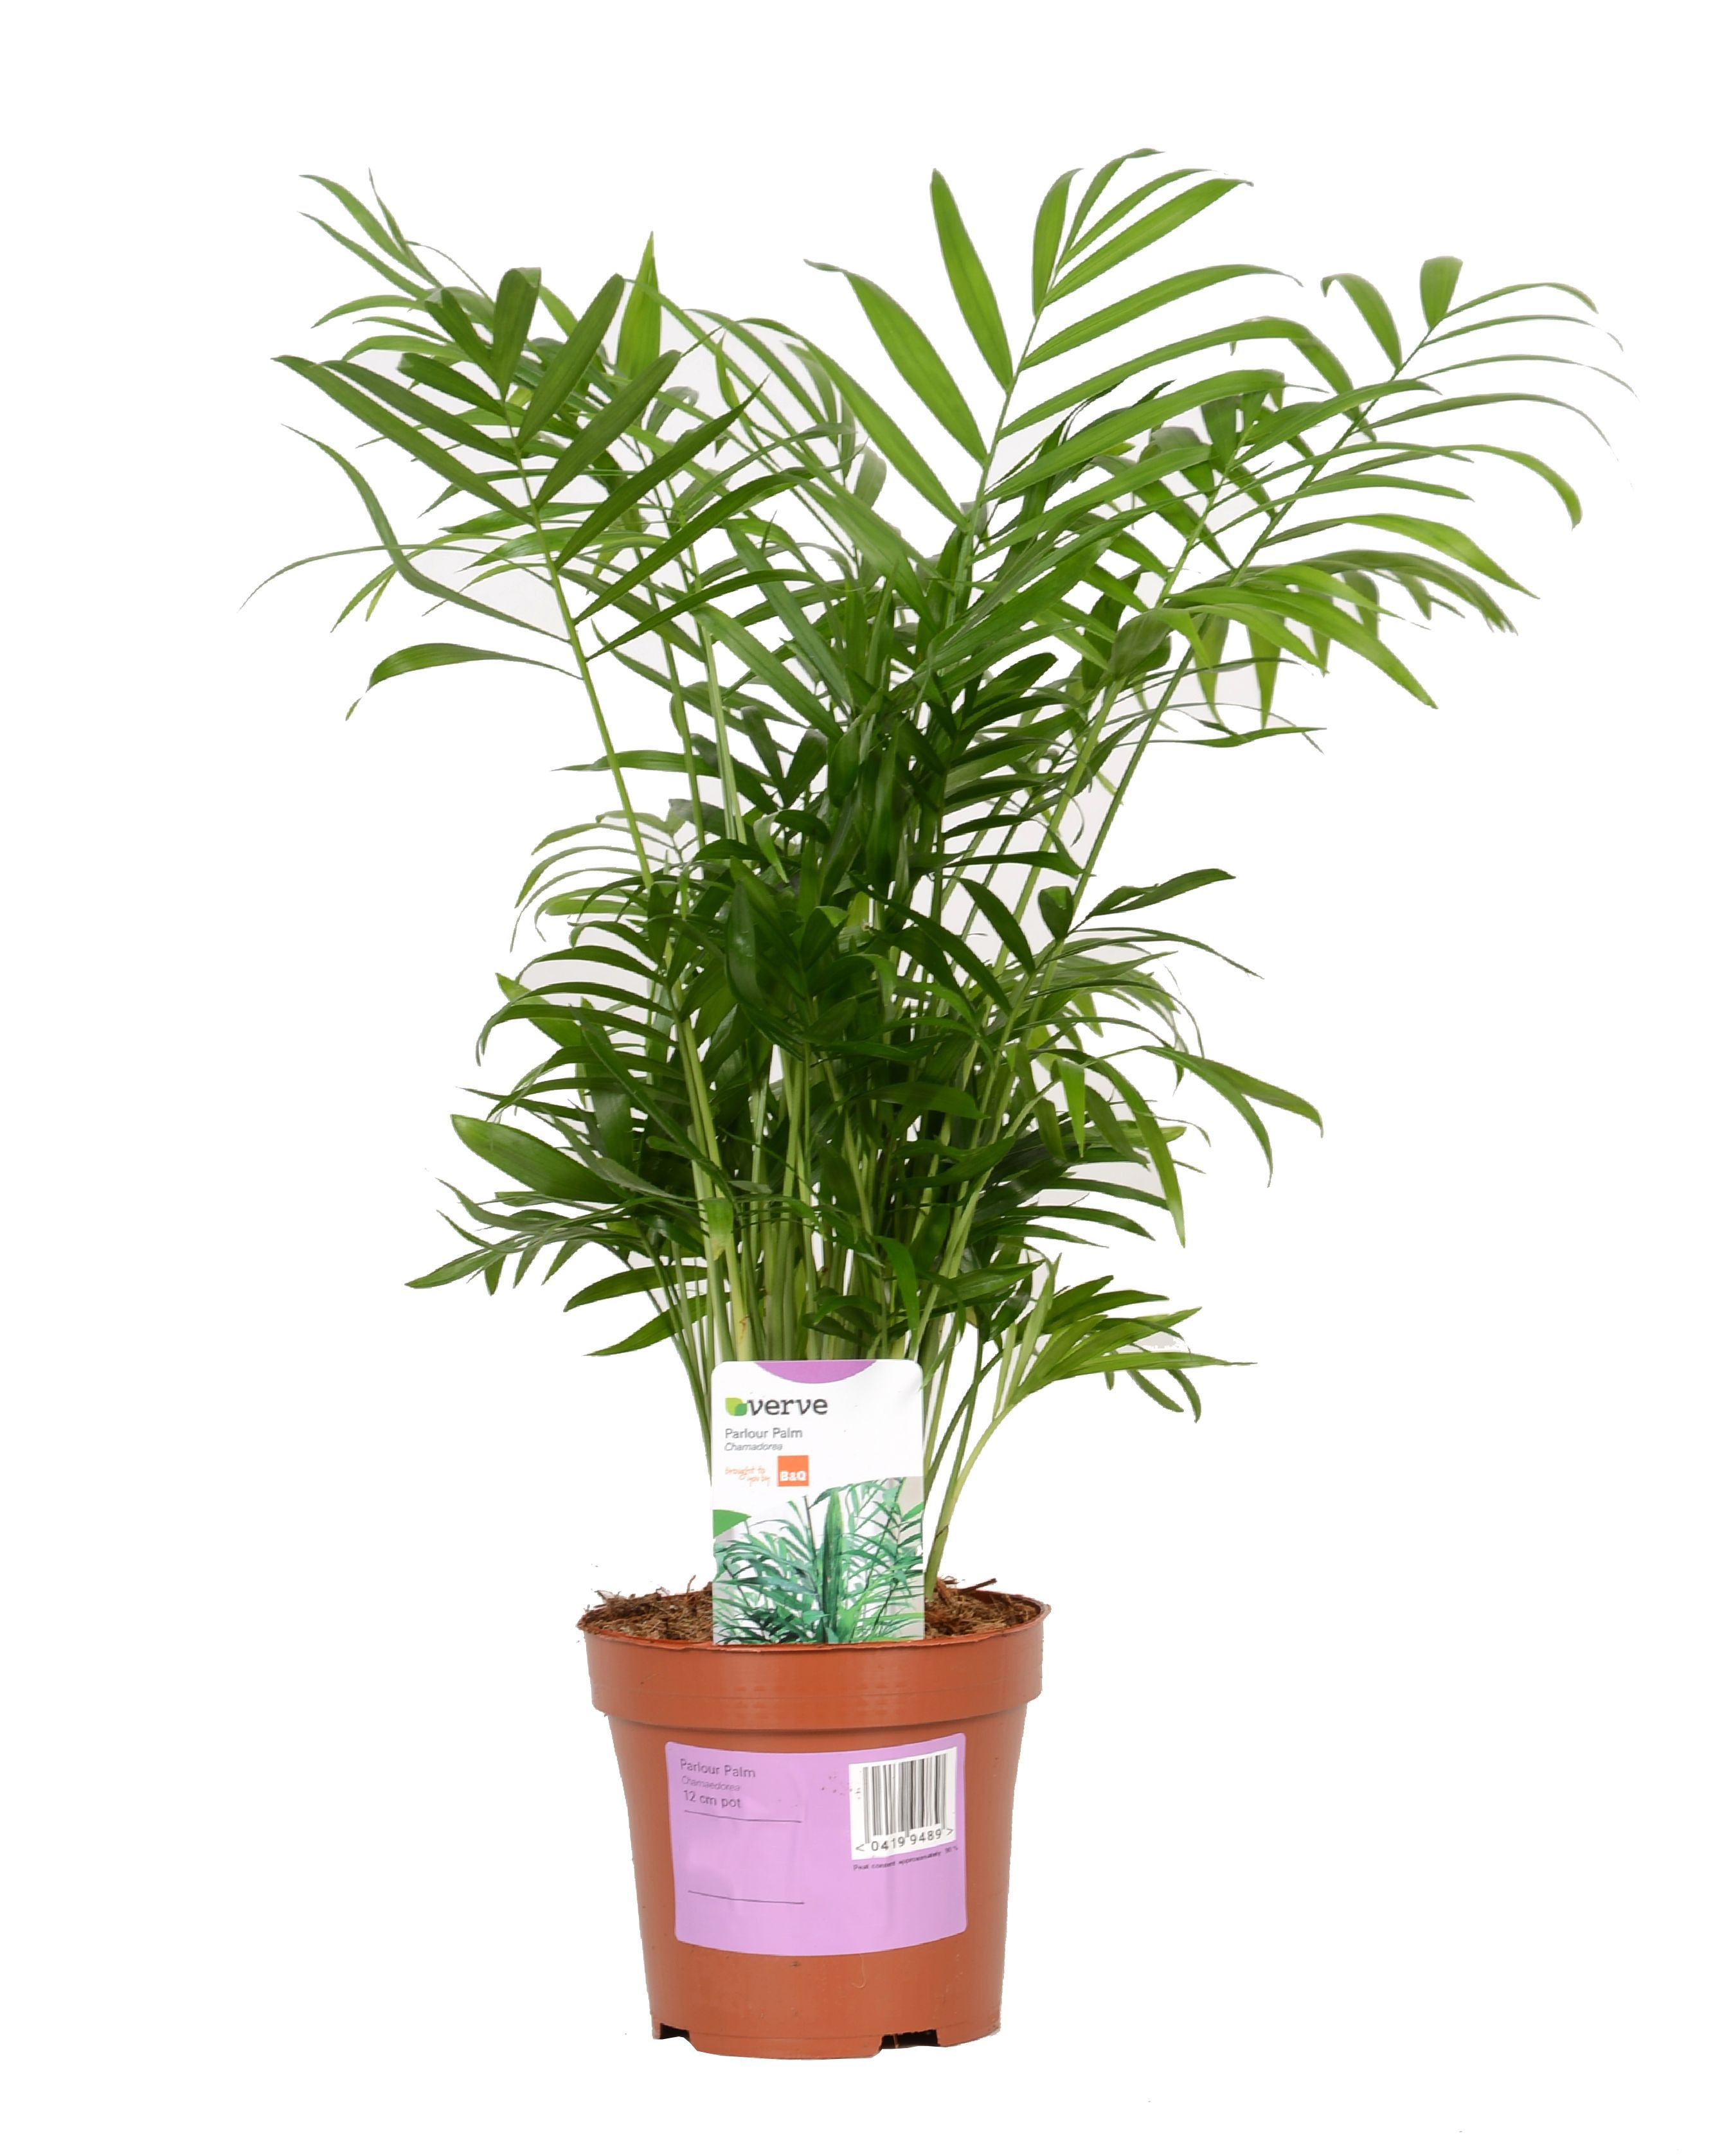 Verve Parlour Palm In Plastic Pot Departments Diy At B Amp Q